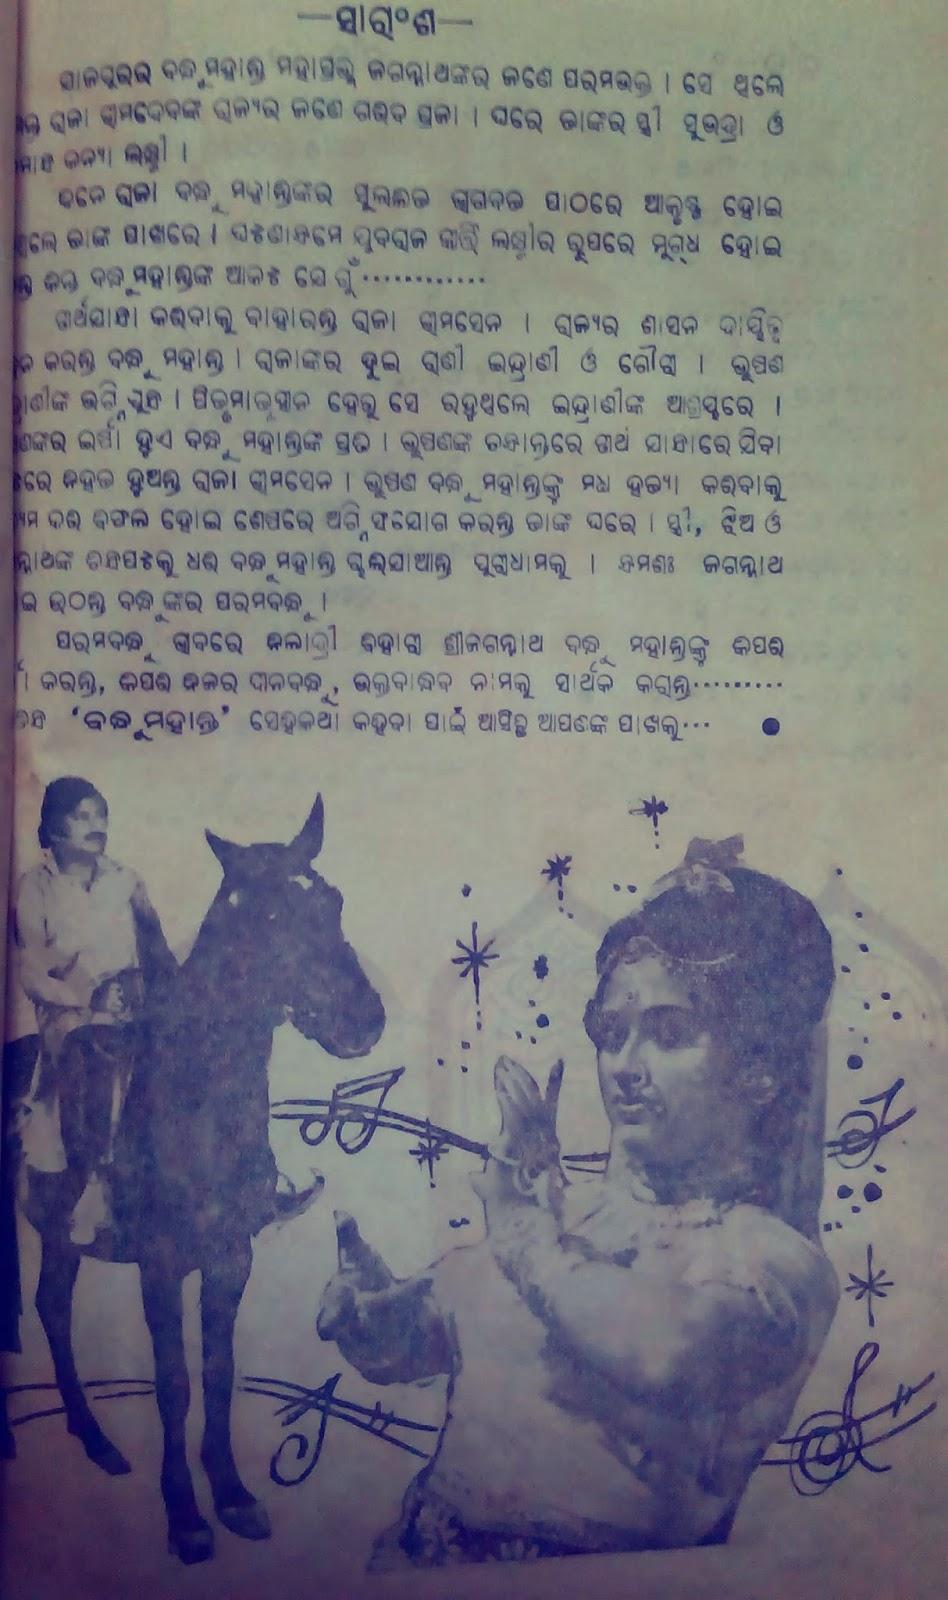 Madison : Namaste prabhu sri jagannath odia song download